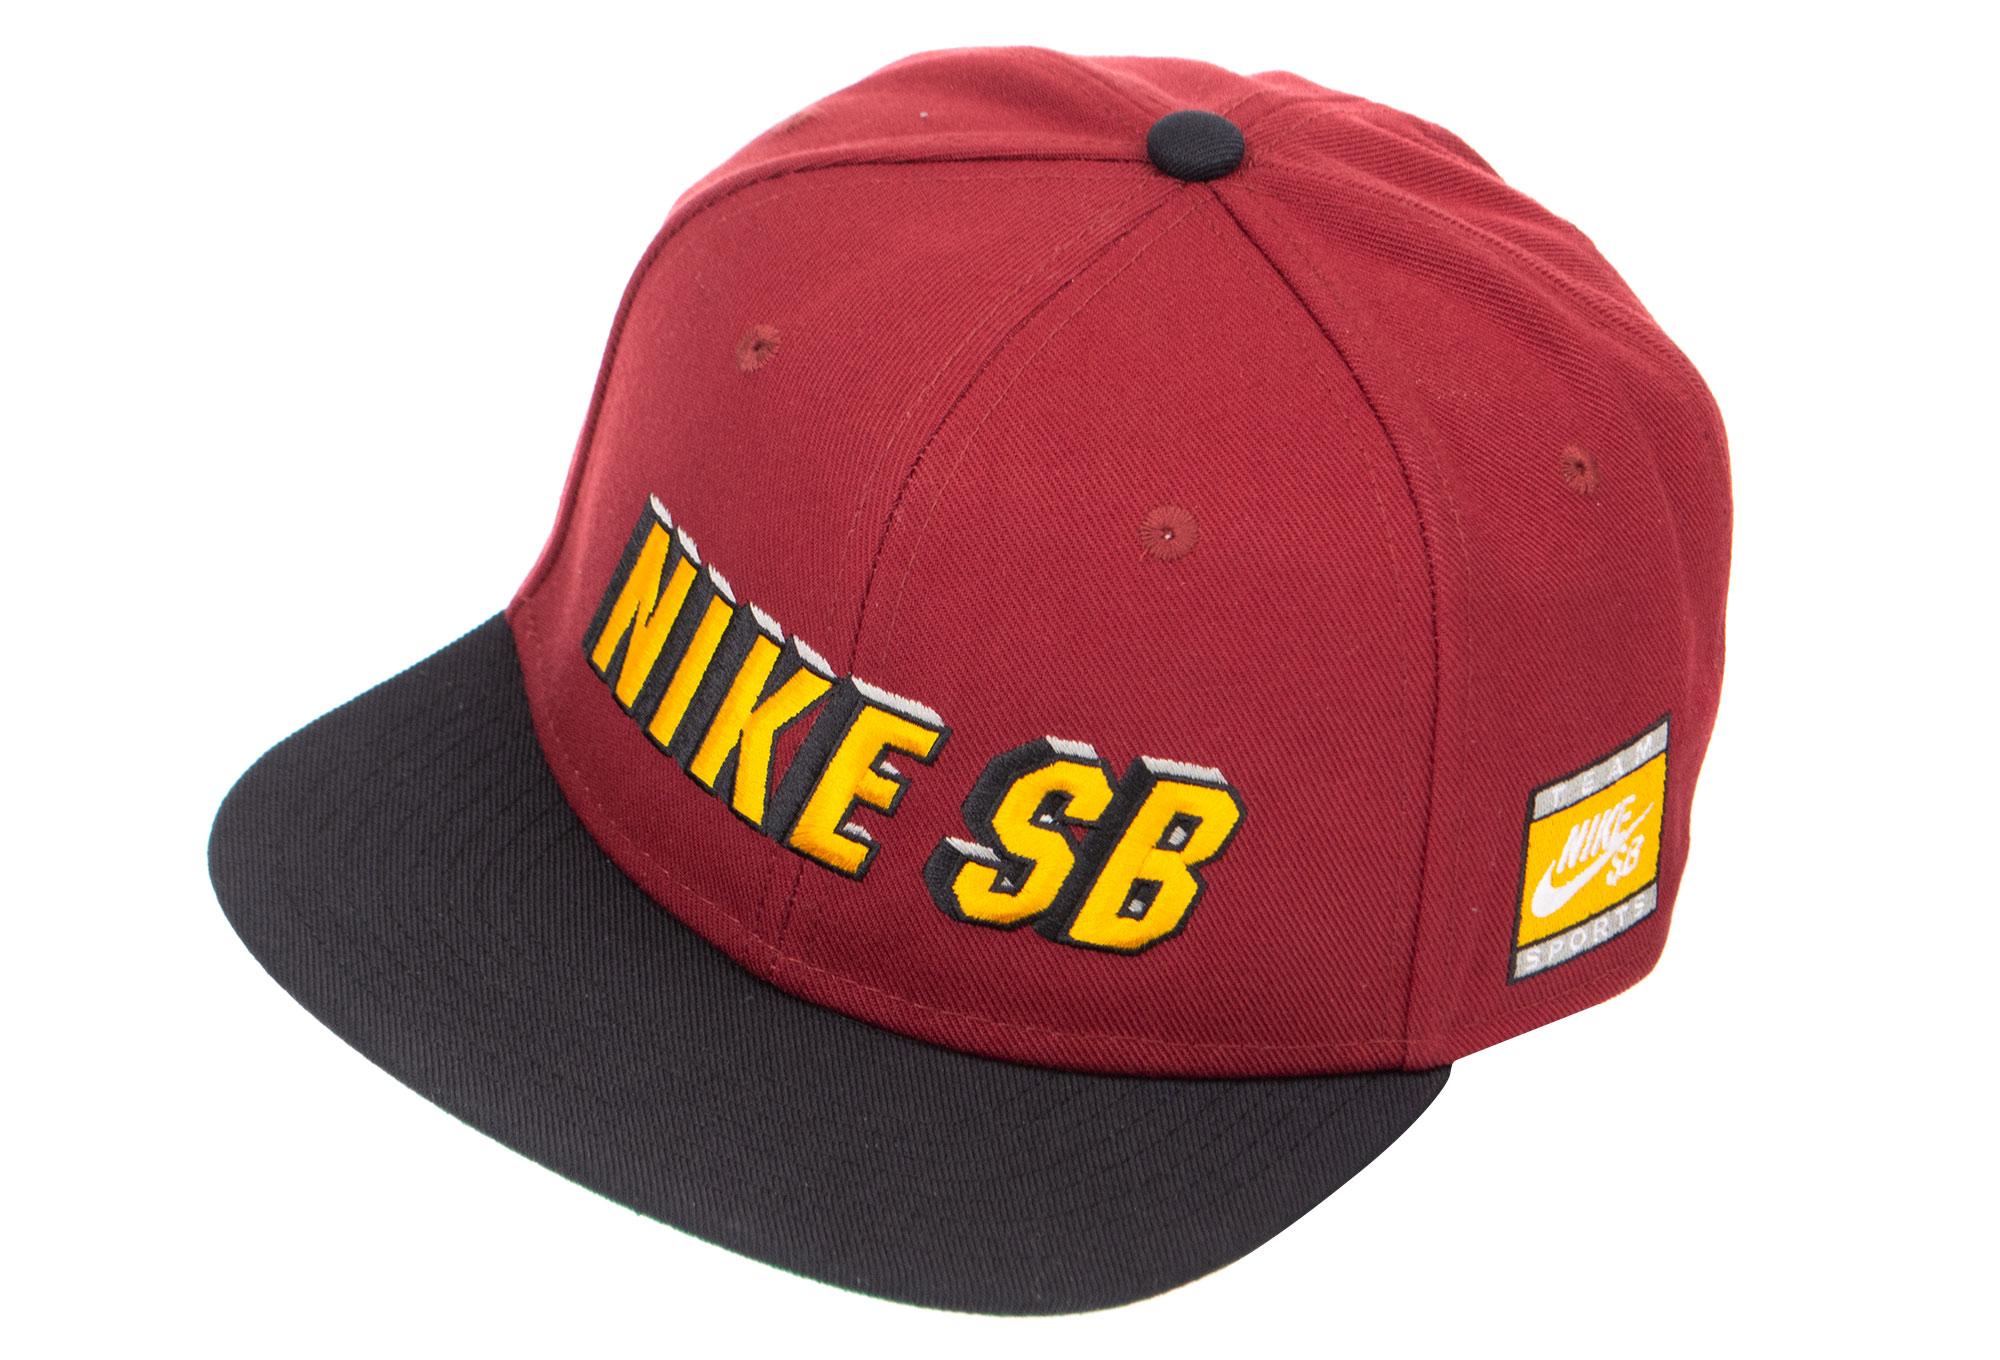 06c8c2d85a7a Nike SB TEAM RED BLACK UNIVERSITY GOLD